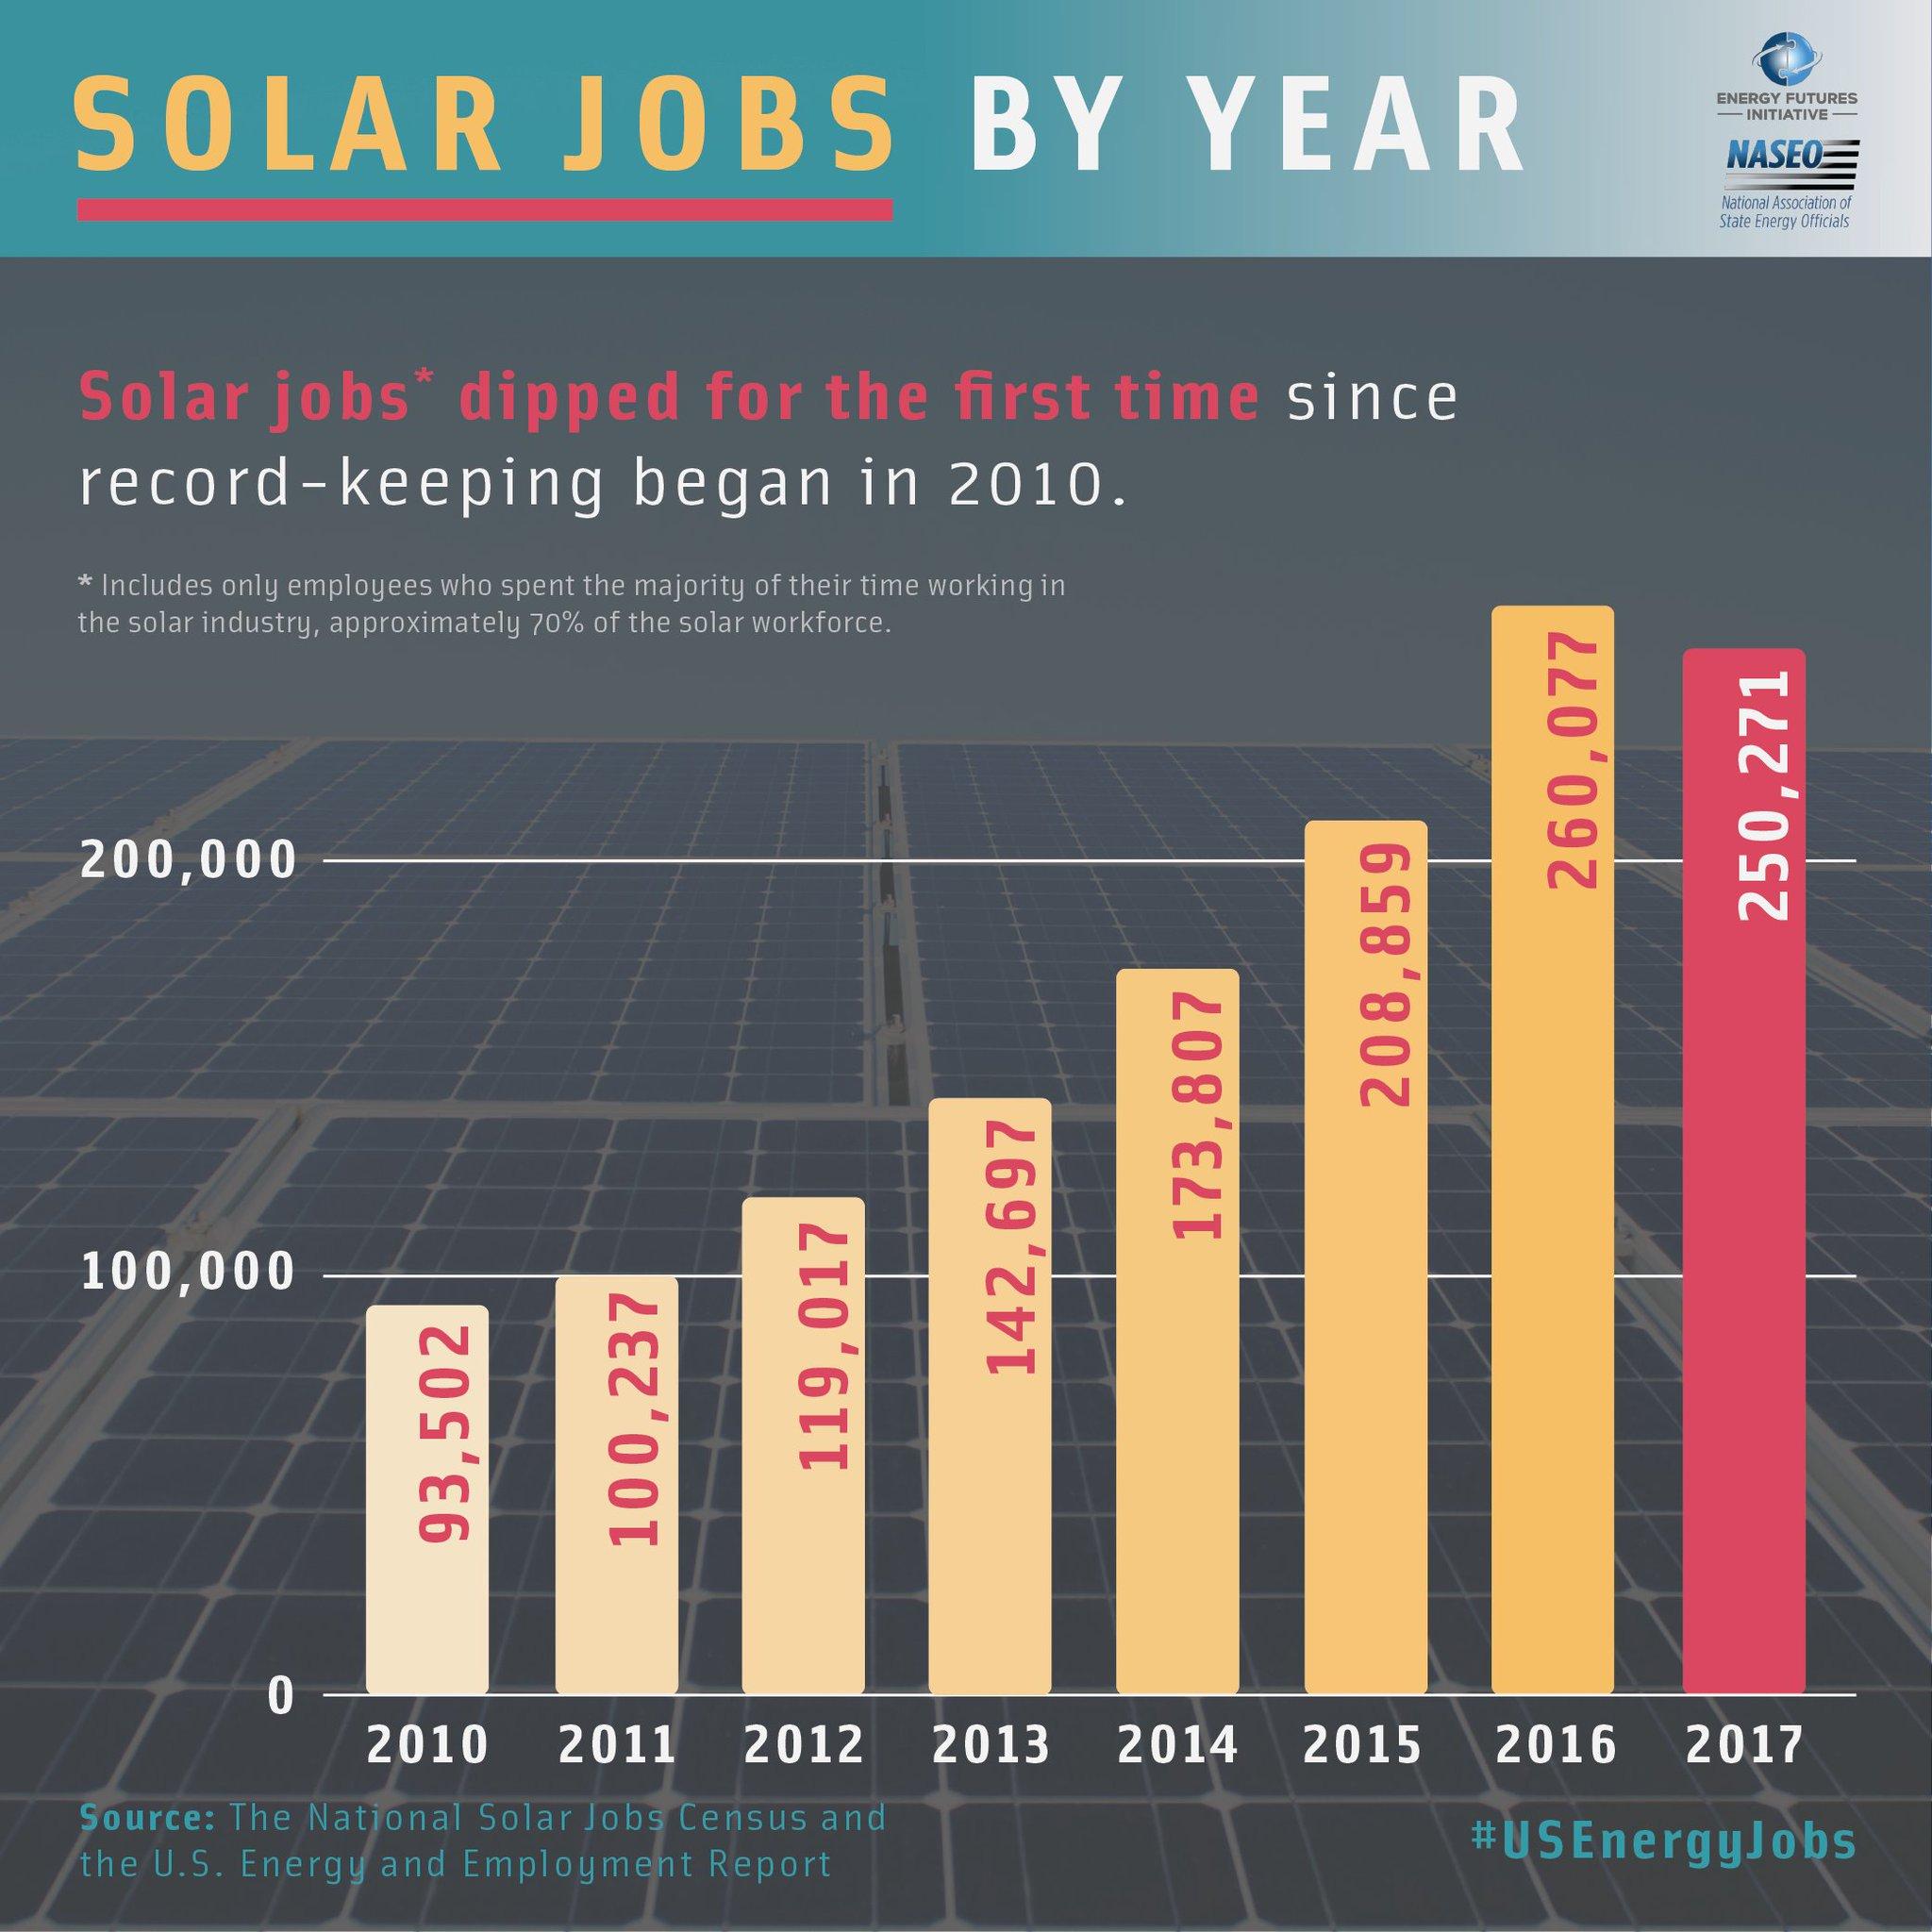 Energy Futures on Twitter: